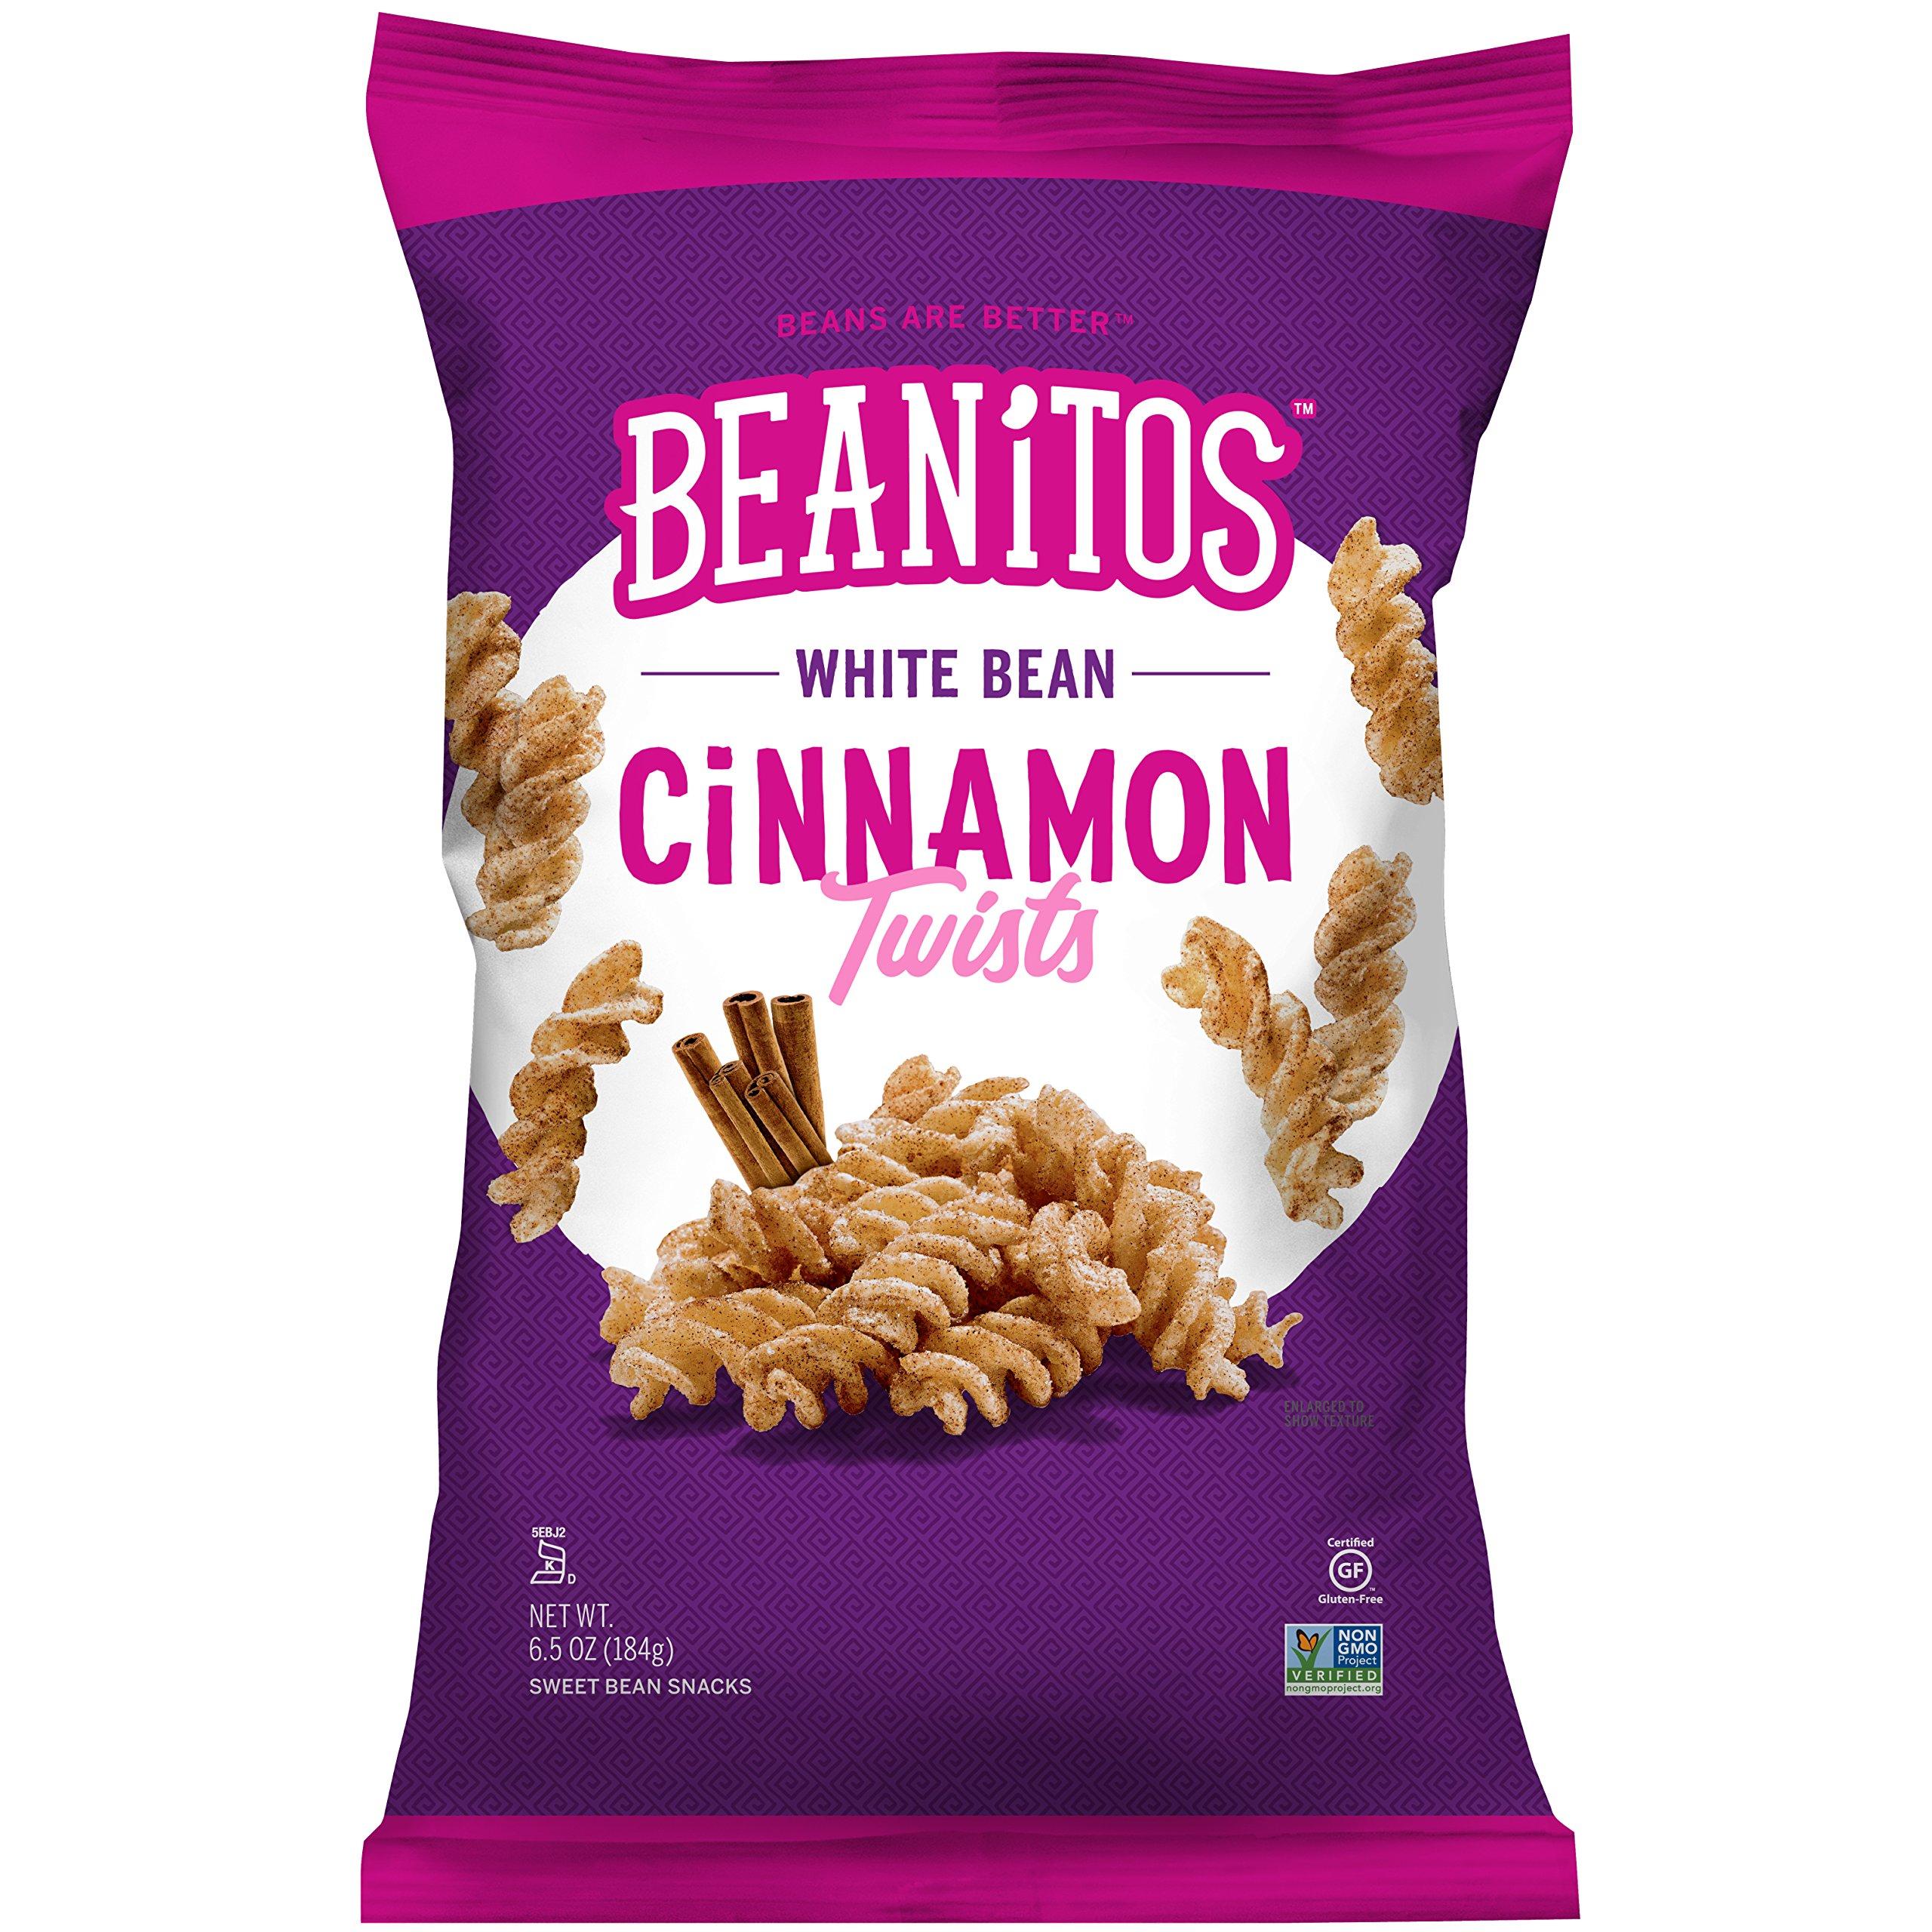 Beanitos White Bean Cinnamon Twists Gluten Free Non-GMO Vegan Corn Free Trans Fat Free Plant Based Sweet Snack 6.5 Ounce